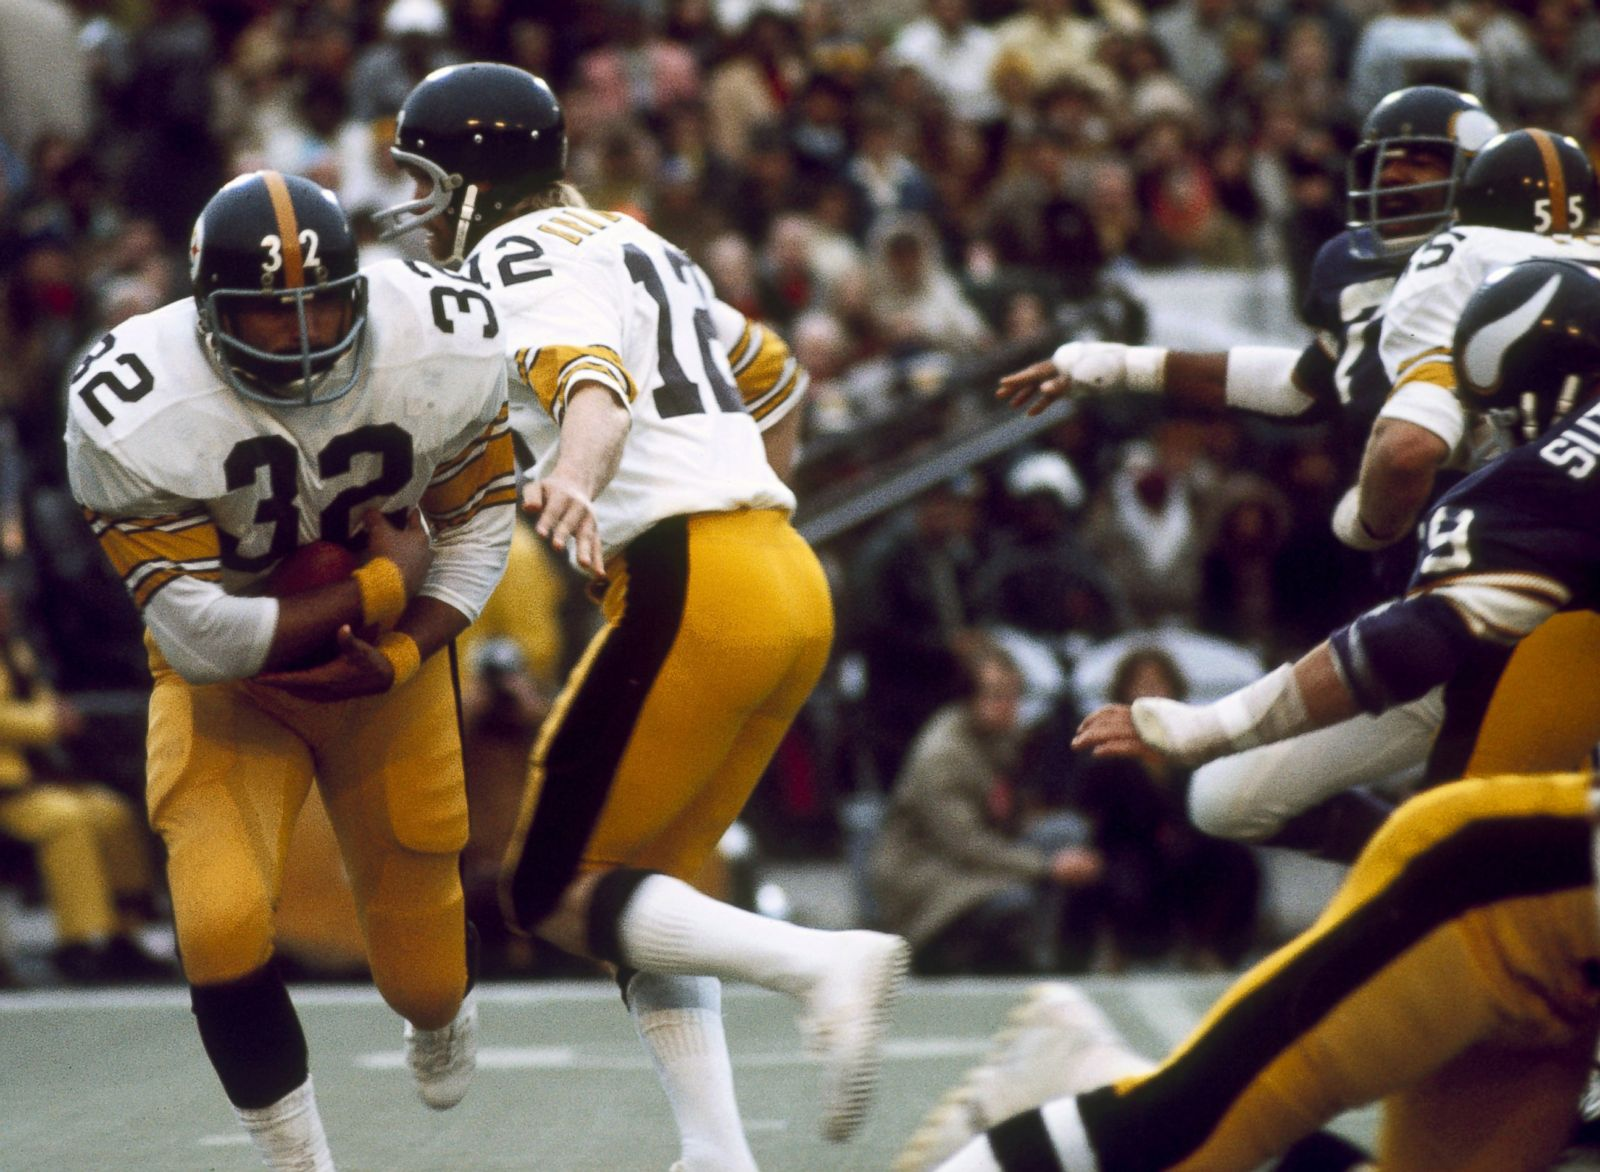 Super Bowl IX Picture | Super Bowl Through the Years - ABC News